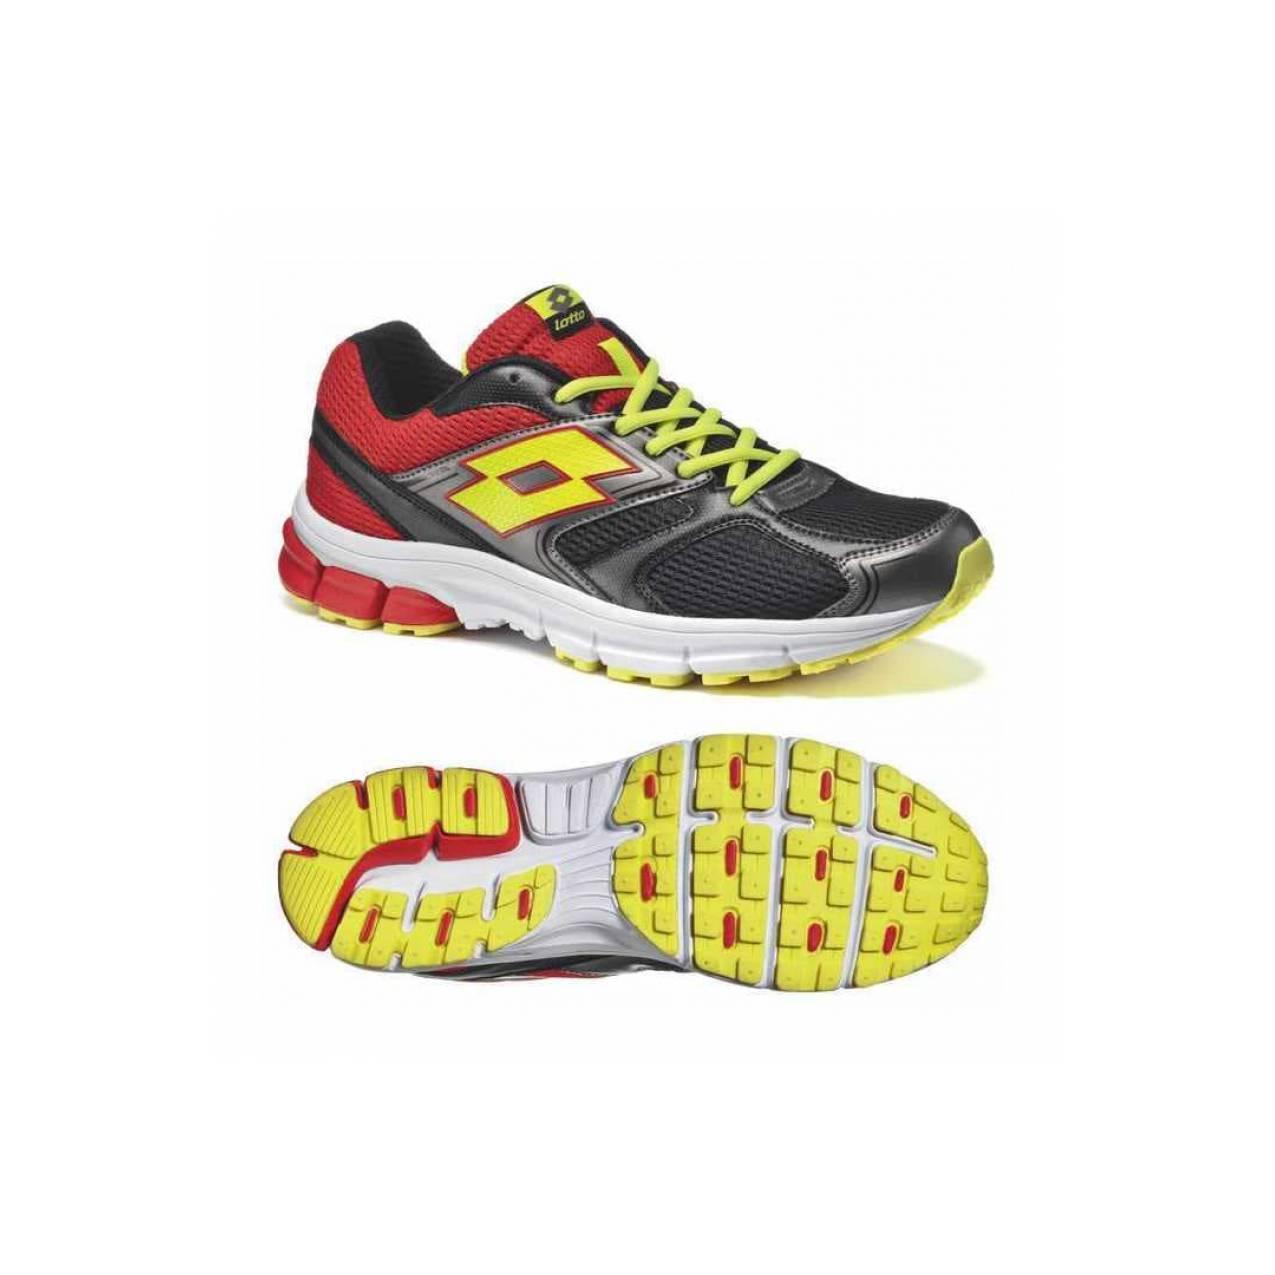 Sepatu Lari Lotto ZENITH VII - BLACK/YELLOW SAF - SR1774BY